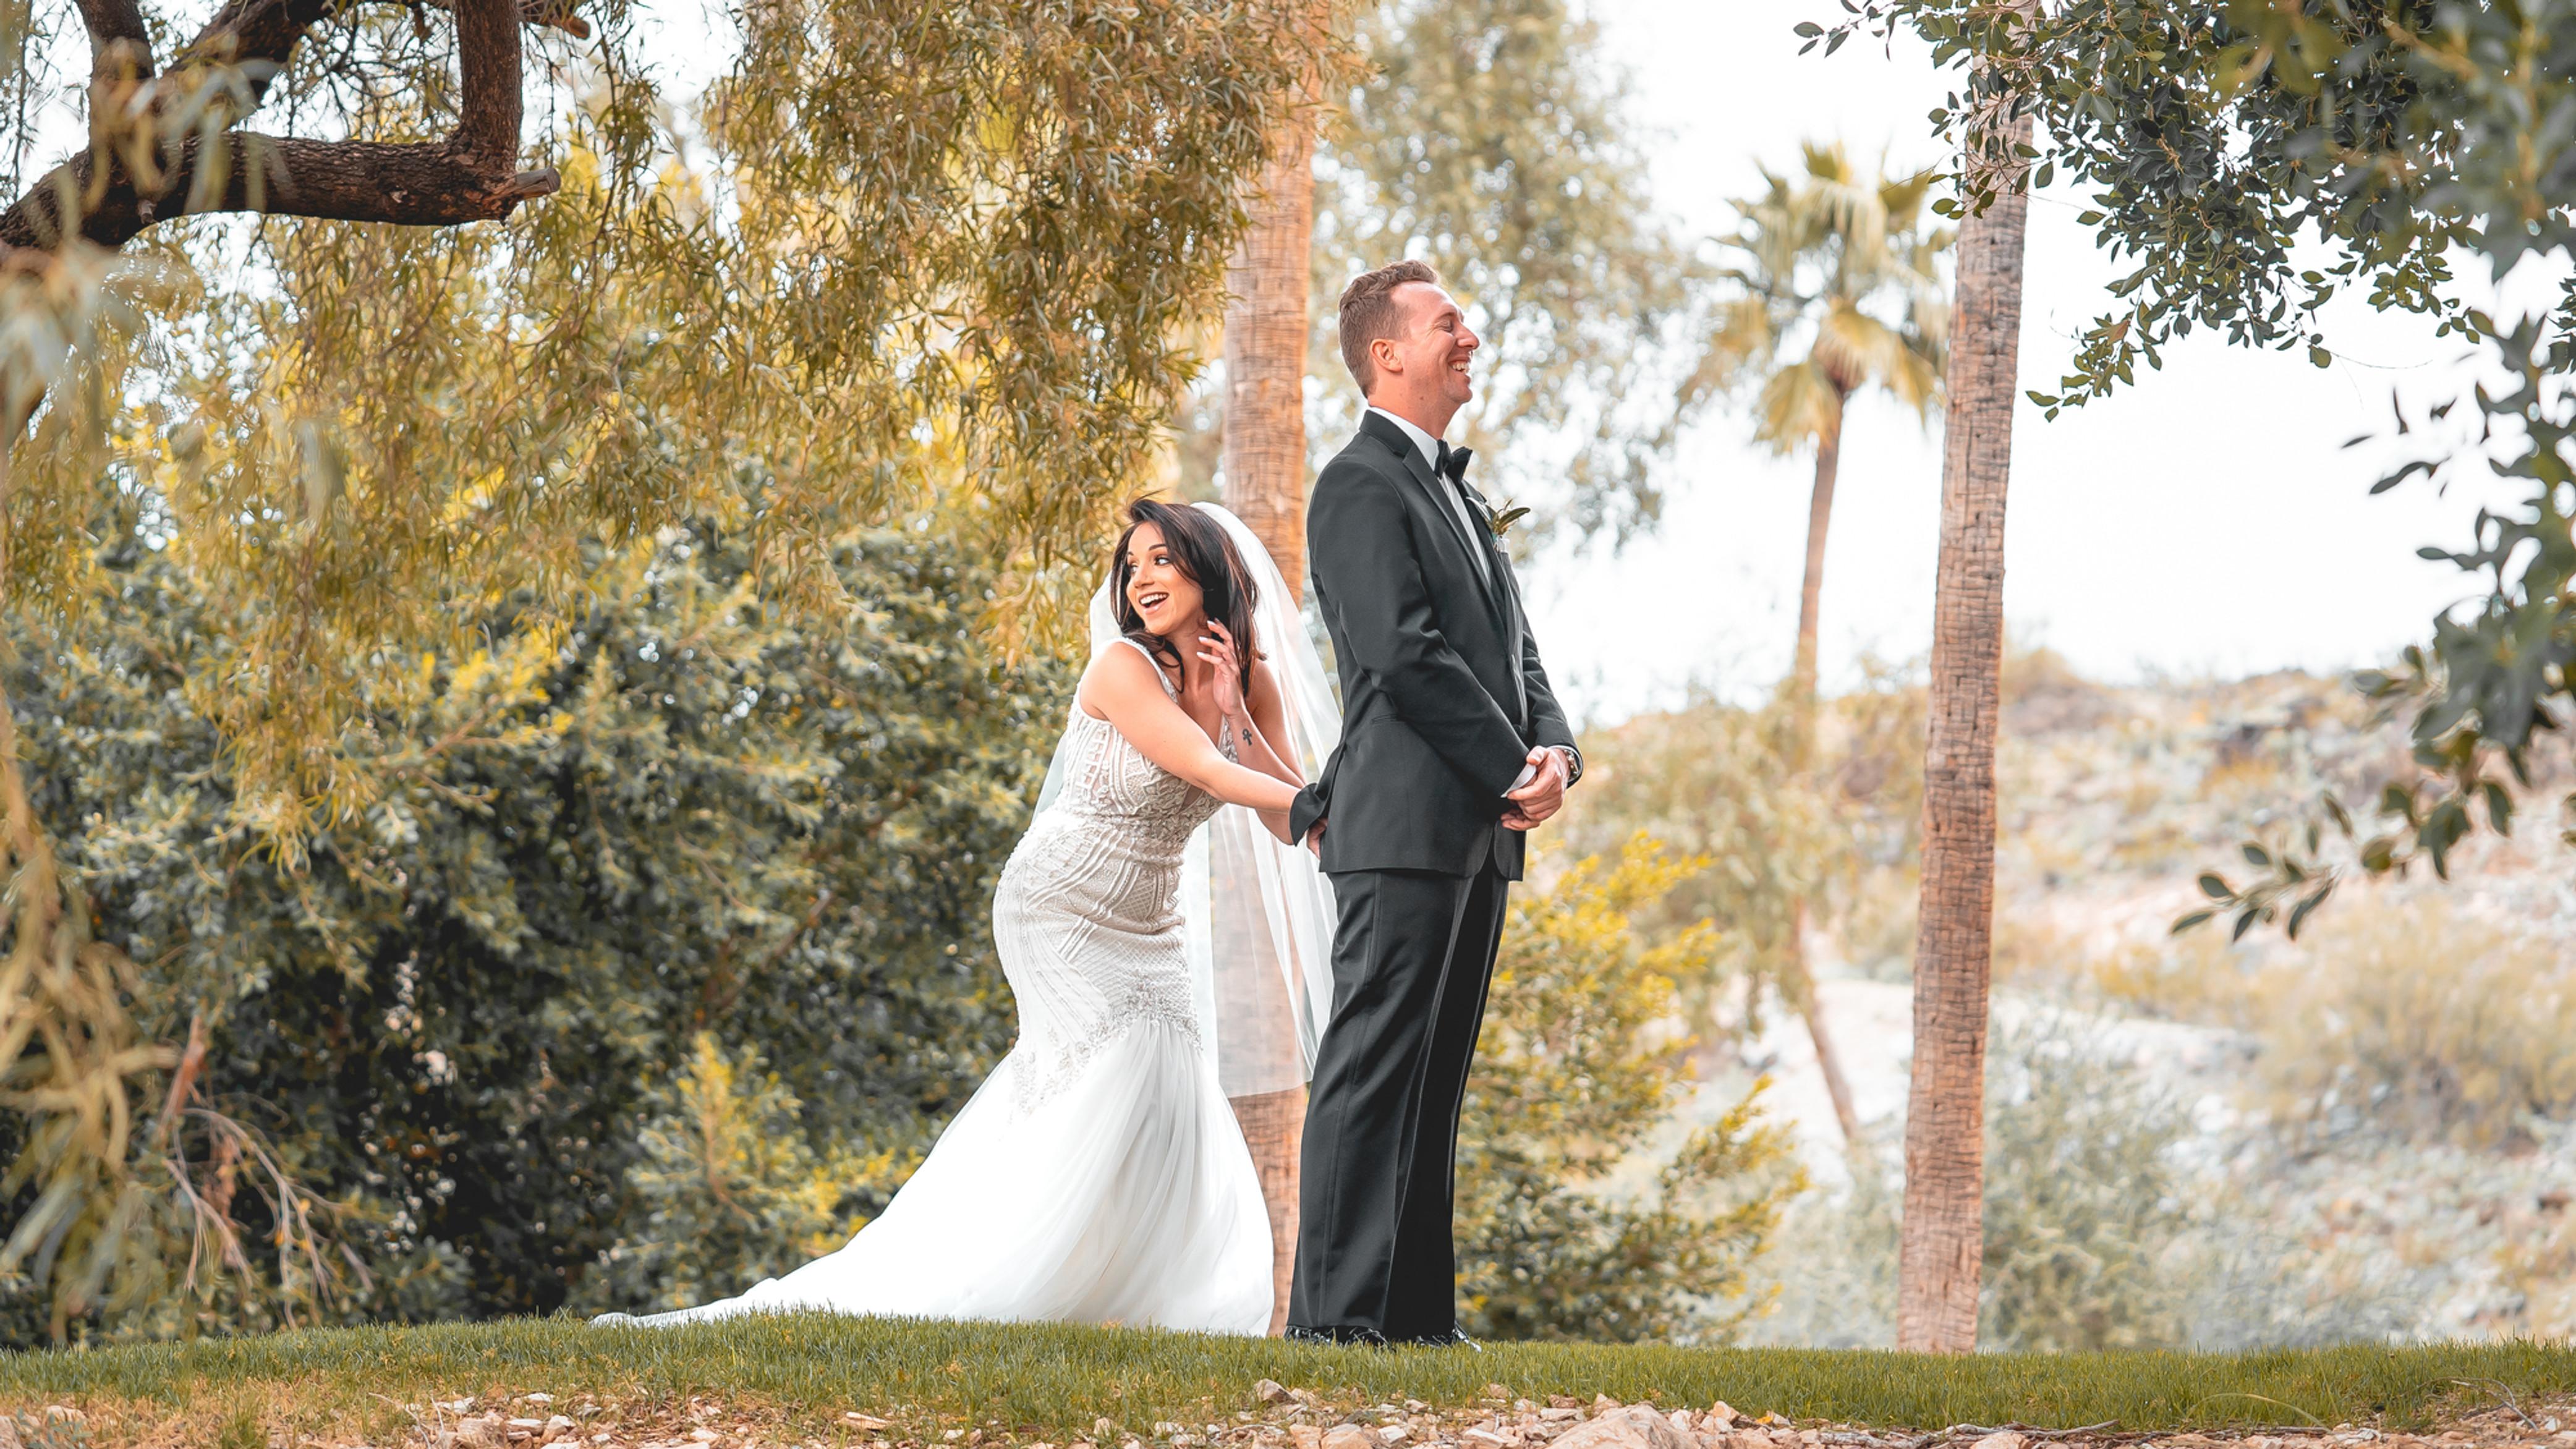 WEDDING PHOTOGRAPHY | Full Day